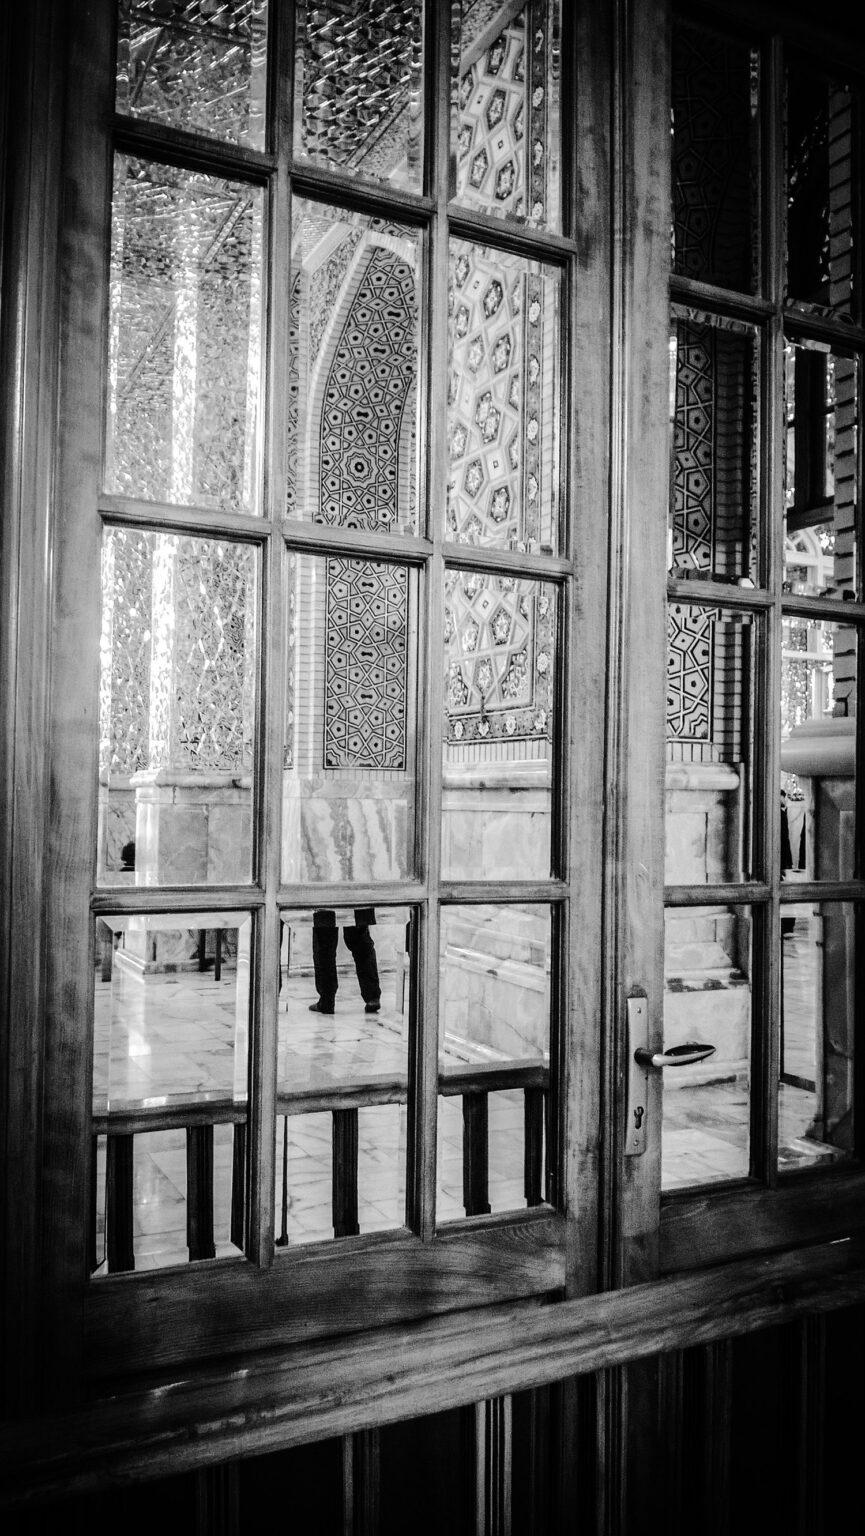 Holy Shrine Of Imam Reza, Mashhad, Iran, 2015.